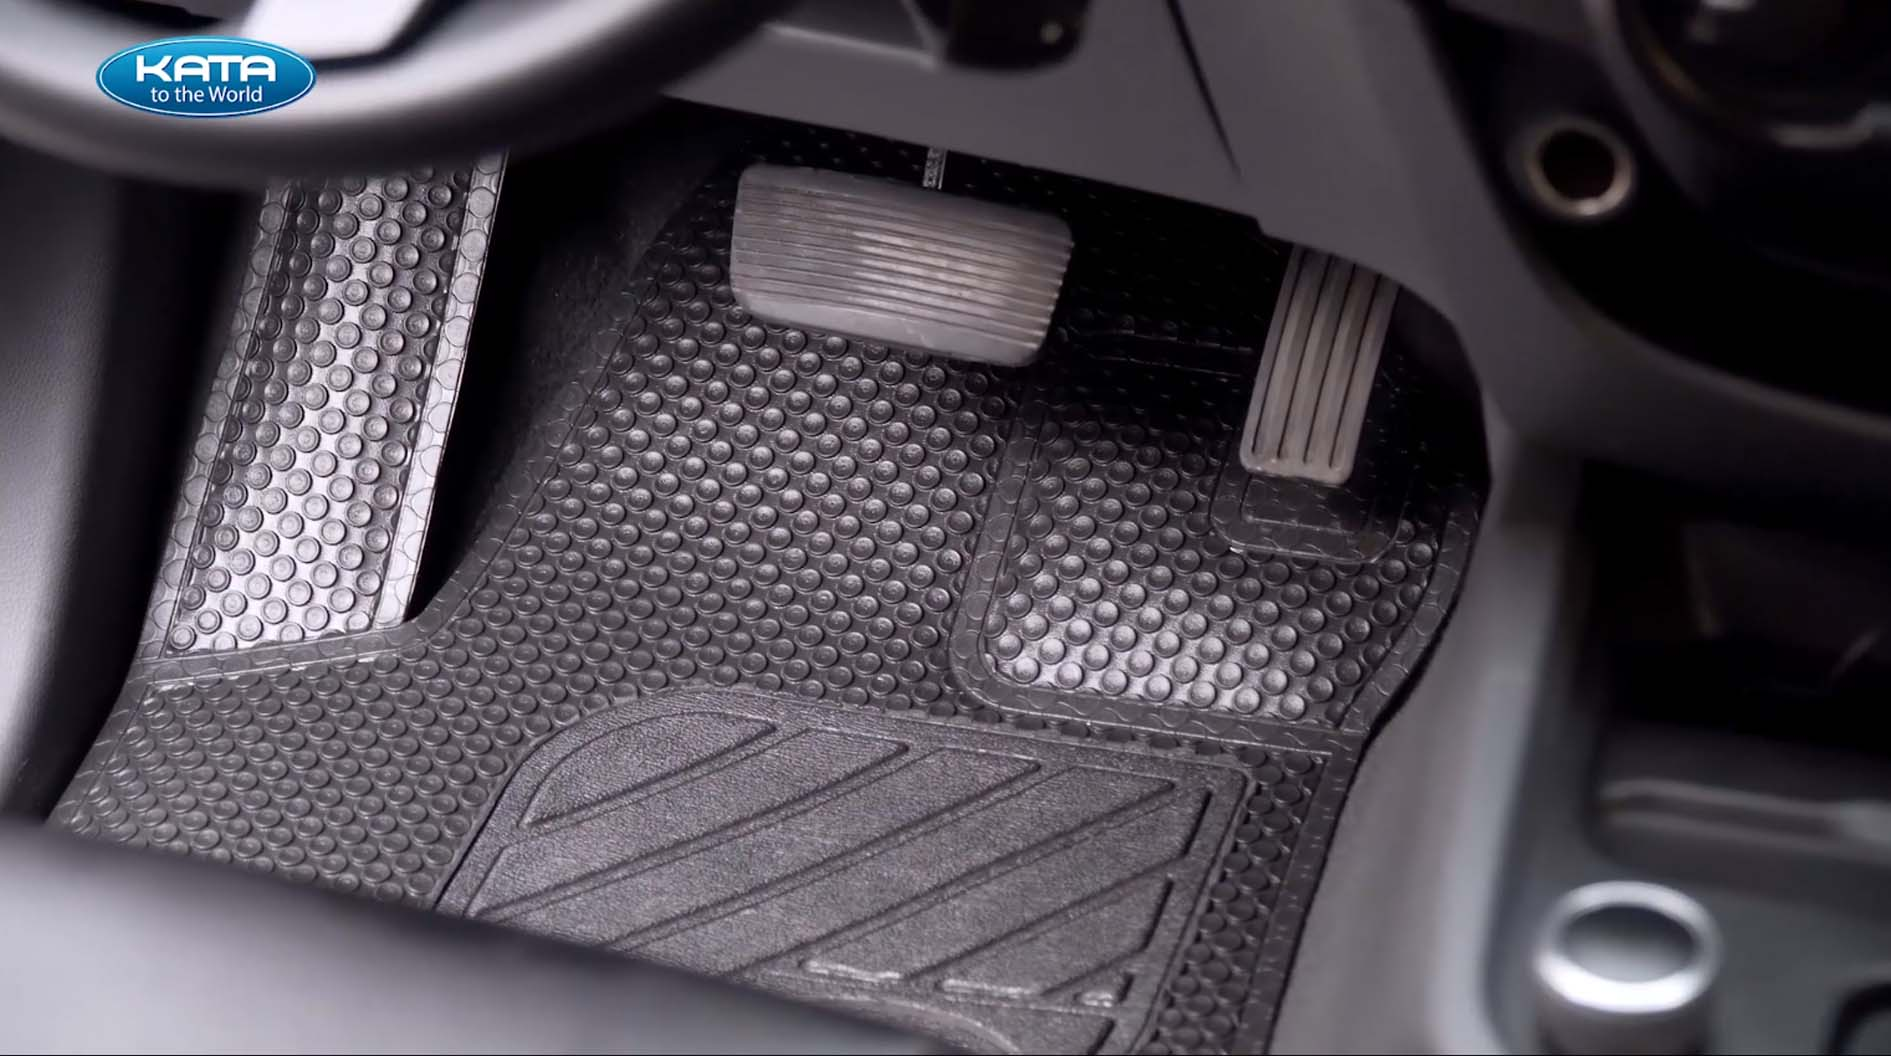 Thảm lót sàn Ford Ranger bản KATA Pro